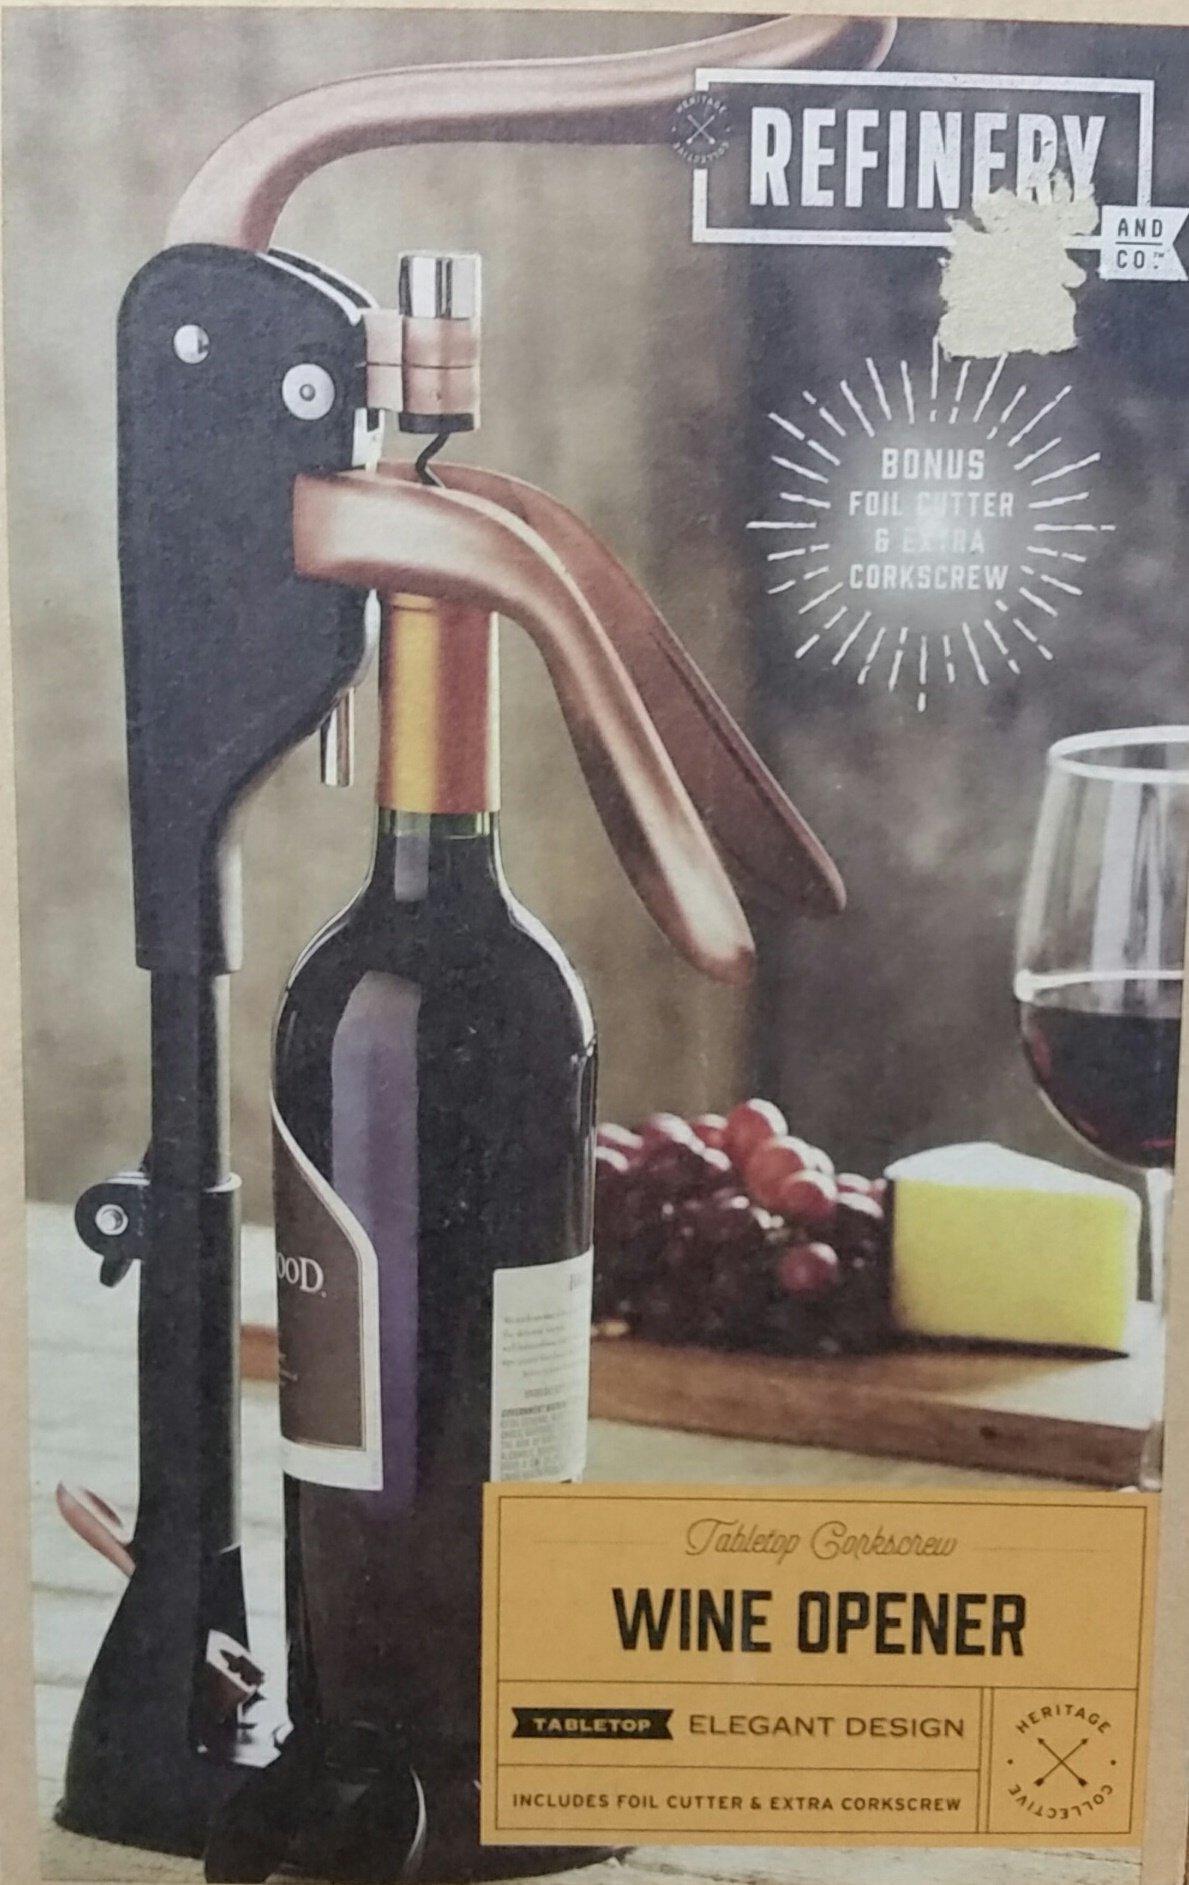 Refinery Tabletop Corkscrew Wine Opener